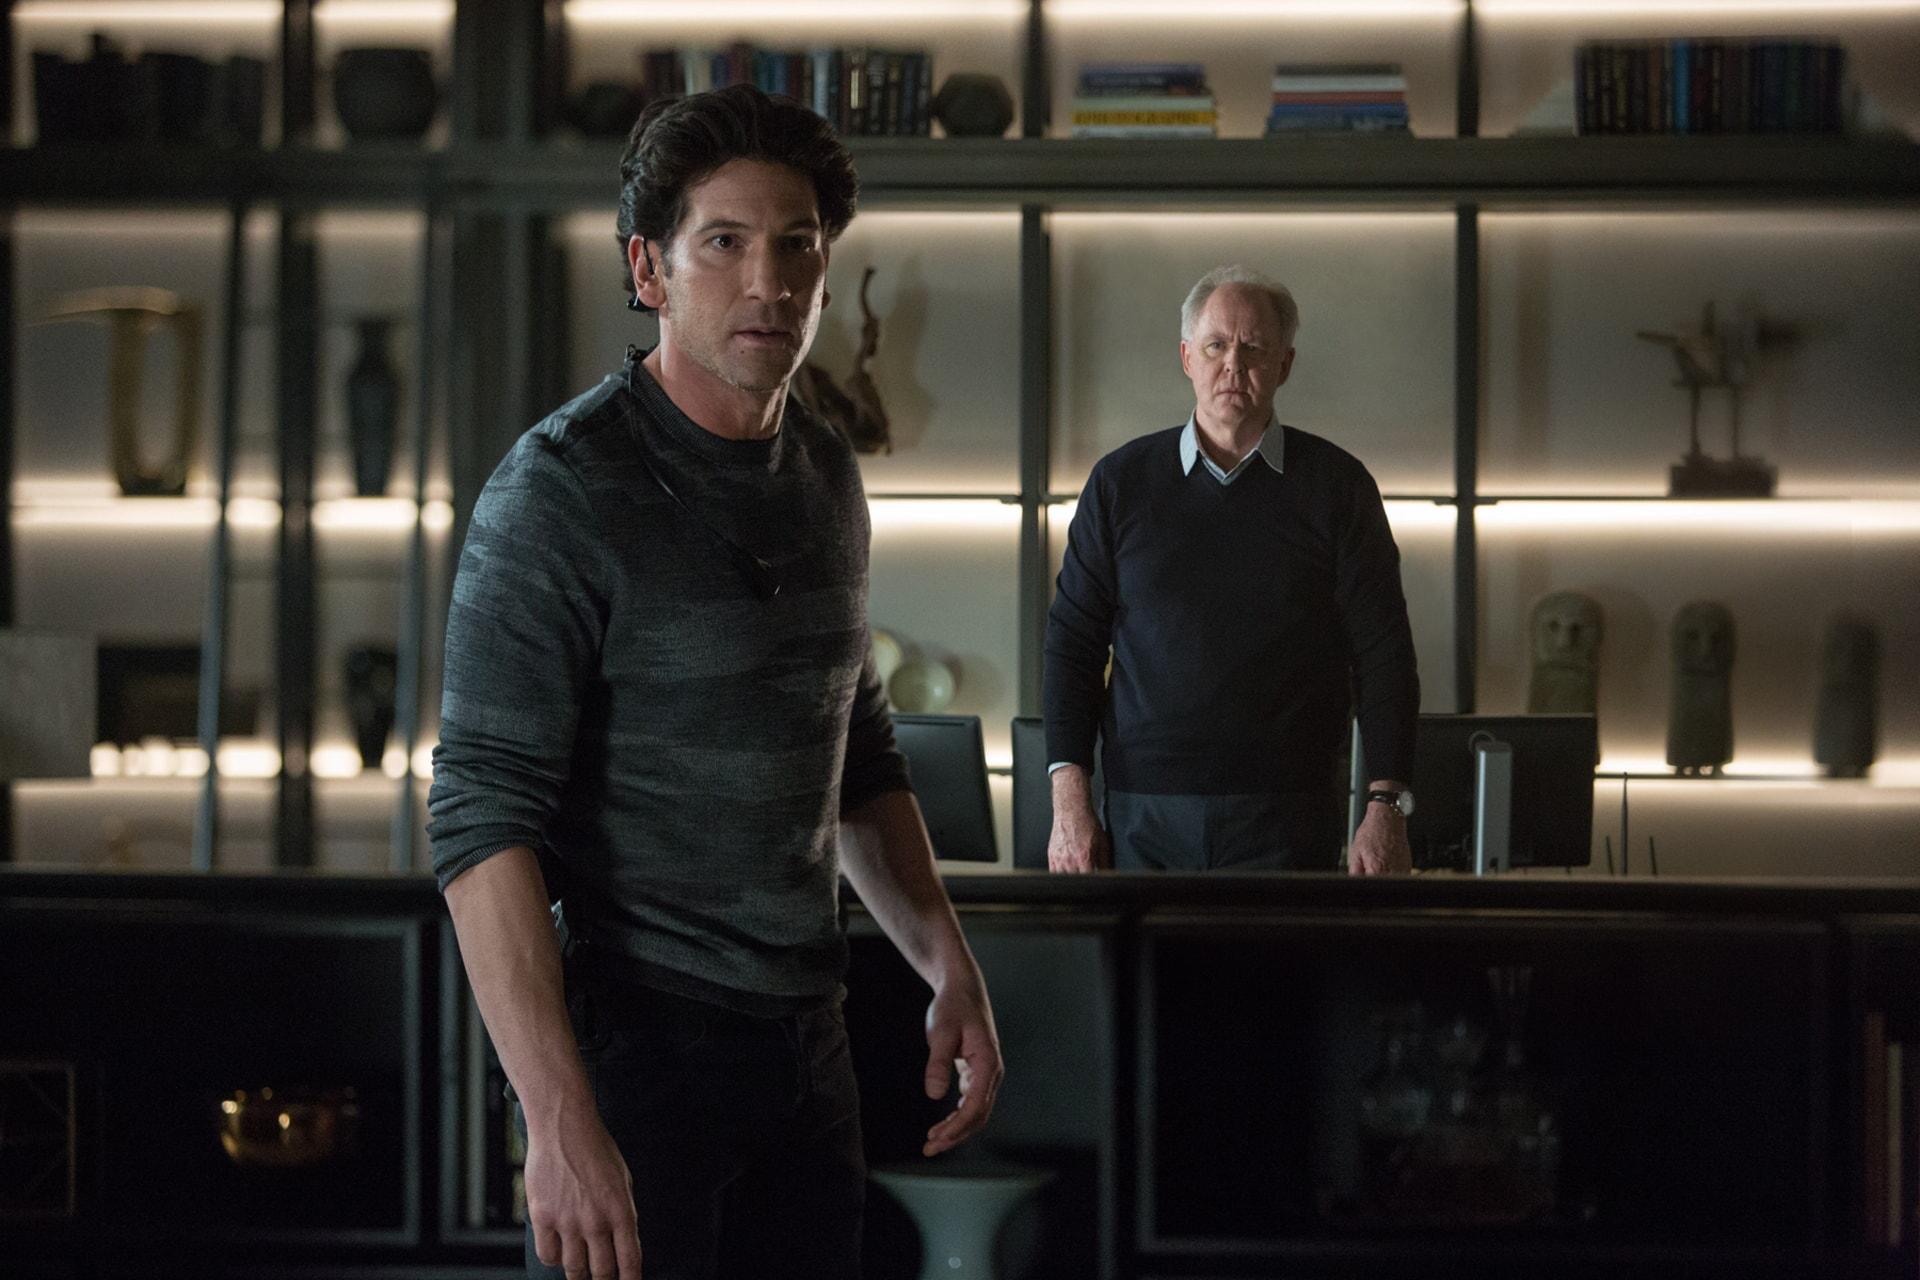 "JON BERNTHAL as Brax and JOHN LITHGOW as Lamar Blackburn in Warner Bros. Pictures' ""THE ACCOUNTANT,"" a Warner Bros. Pictures release."